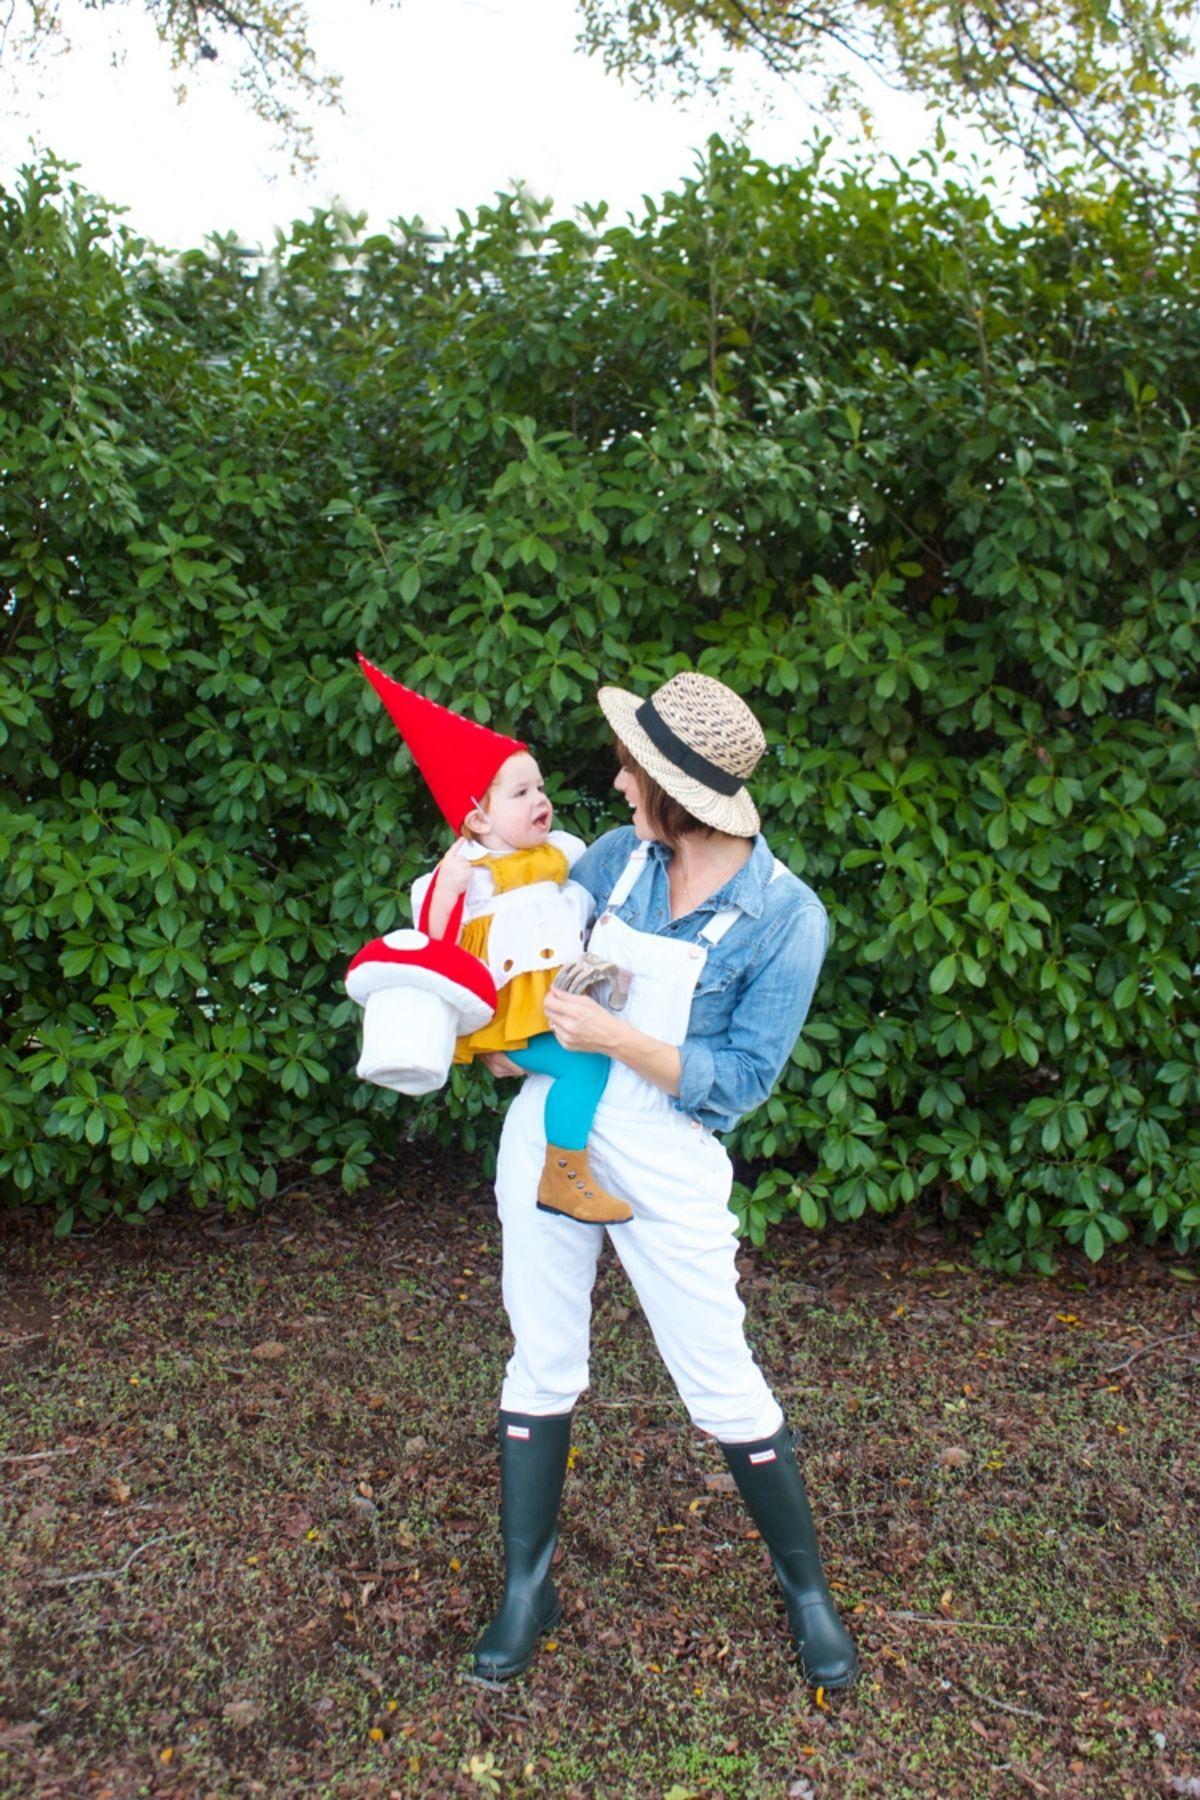 Gardener and Gnome costumes